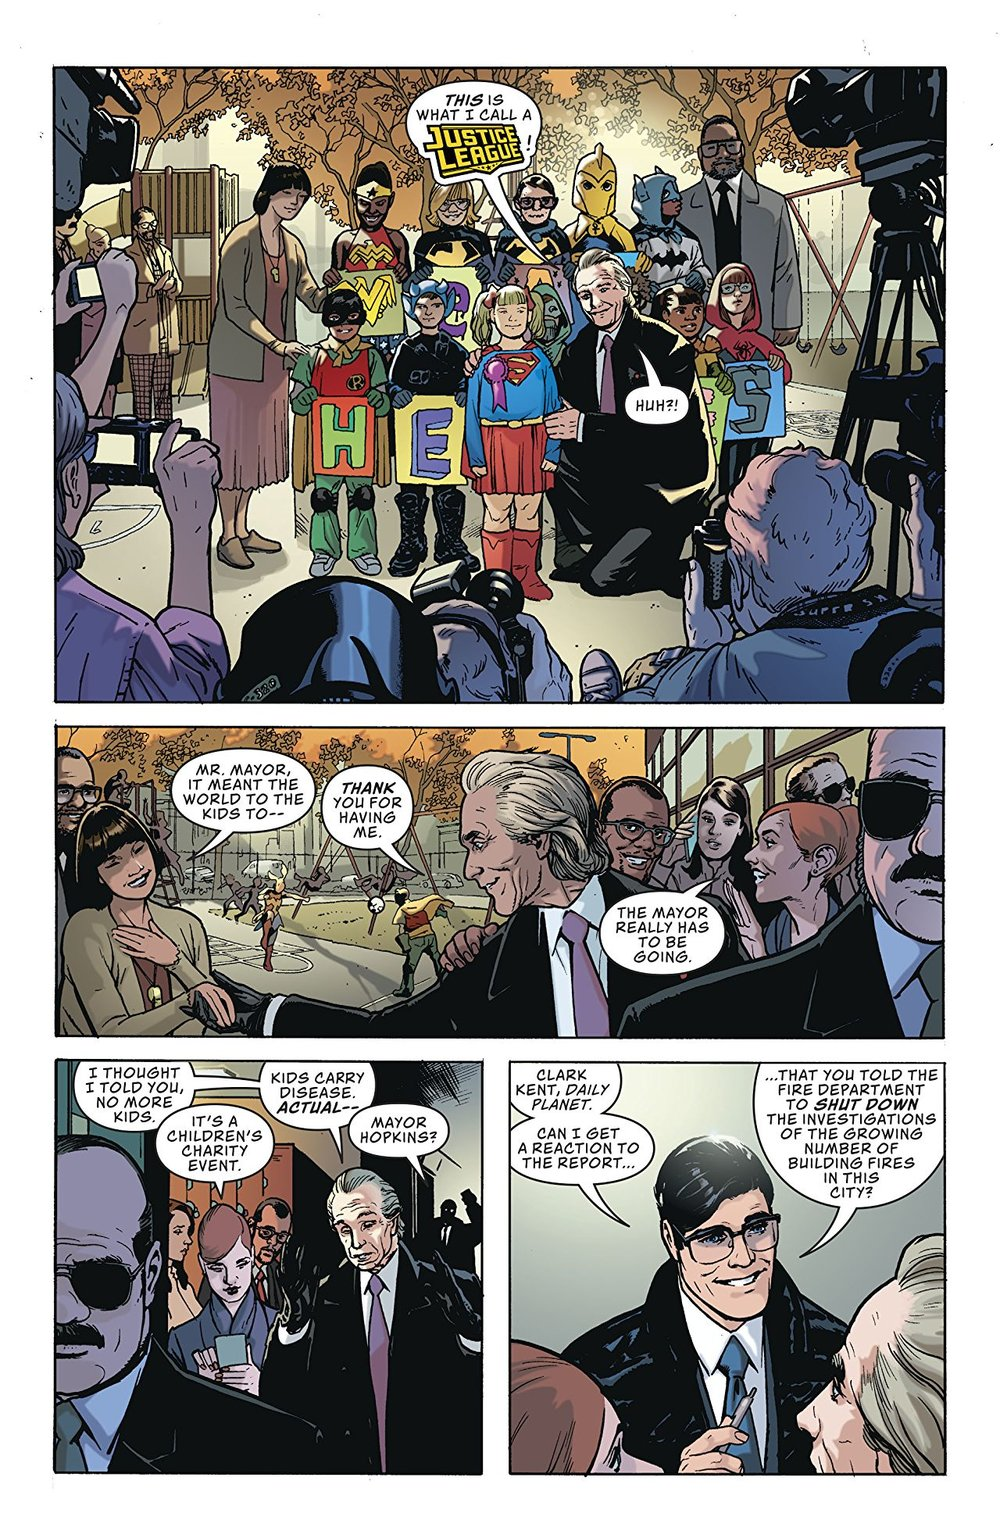 Action Comics 1006 2.jpg